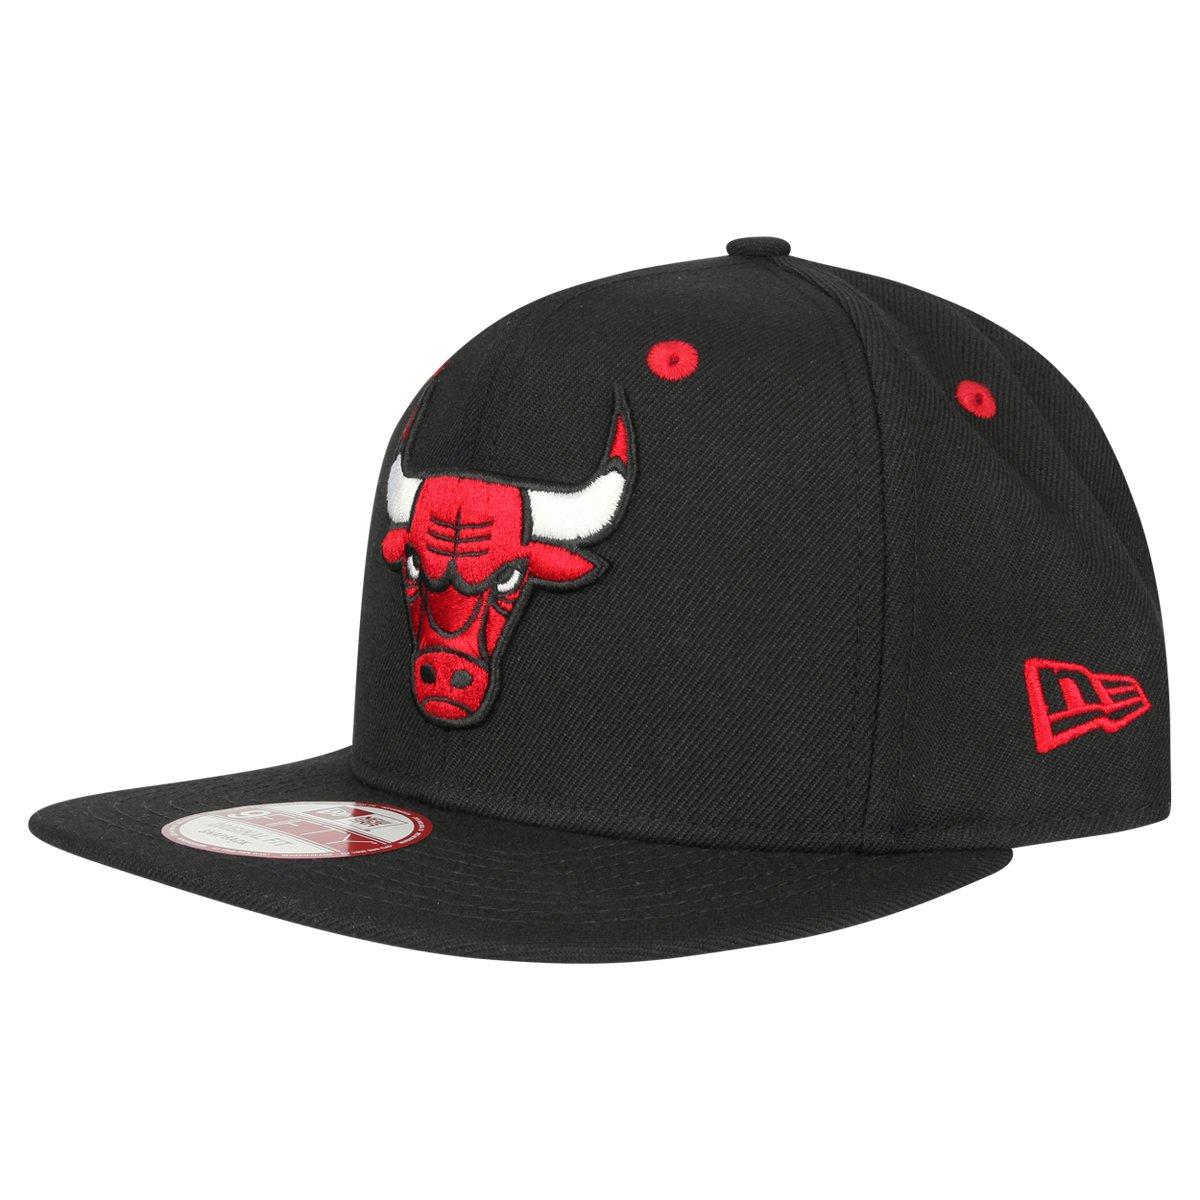 0491b53313b Boné New Era 950 Of Sn NBA Chicago Bulls - Compre Agora